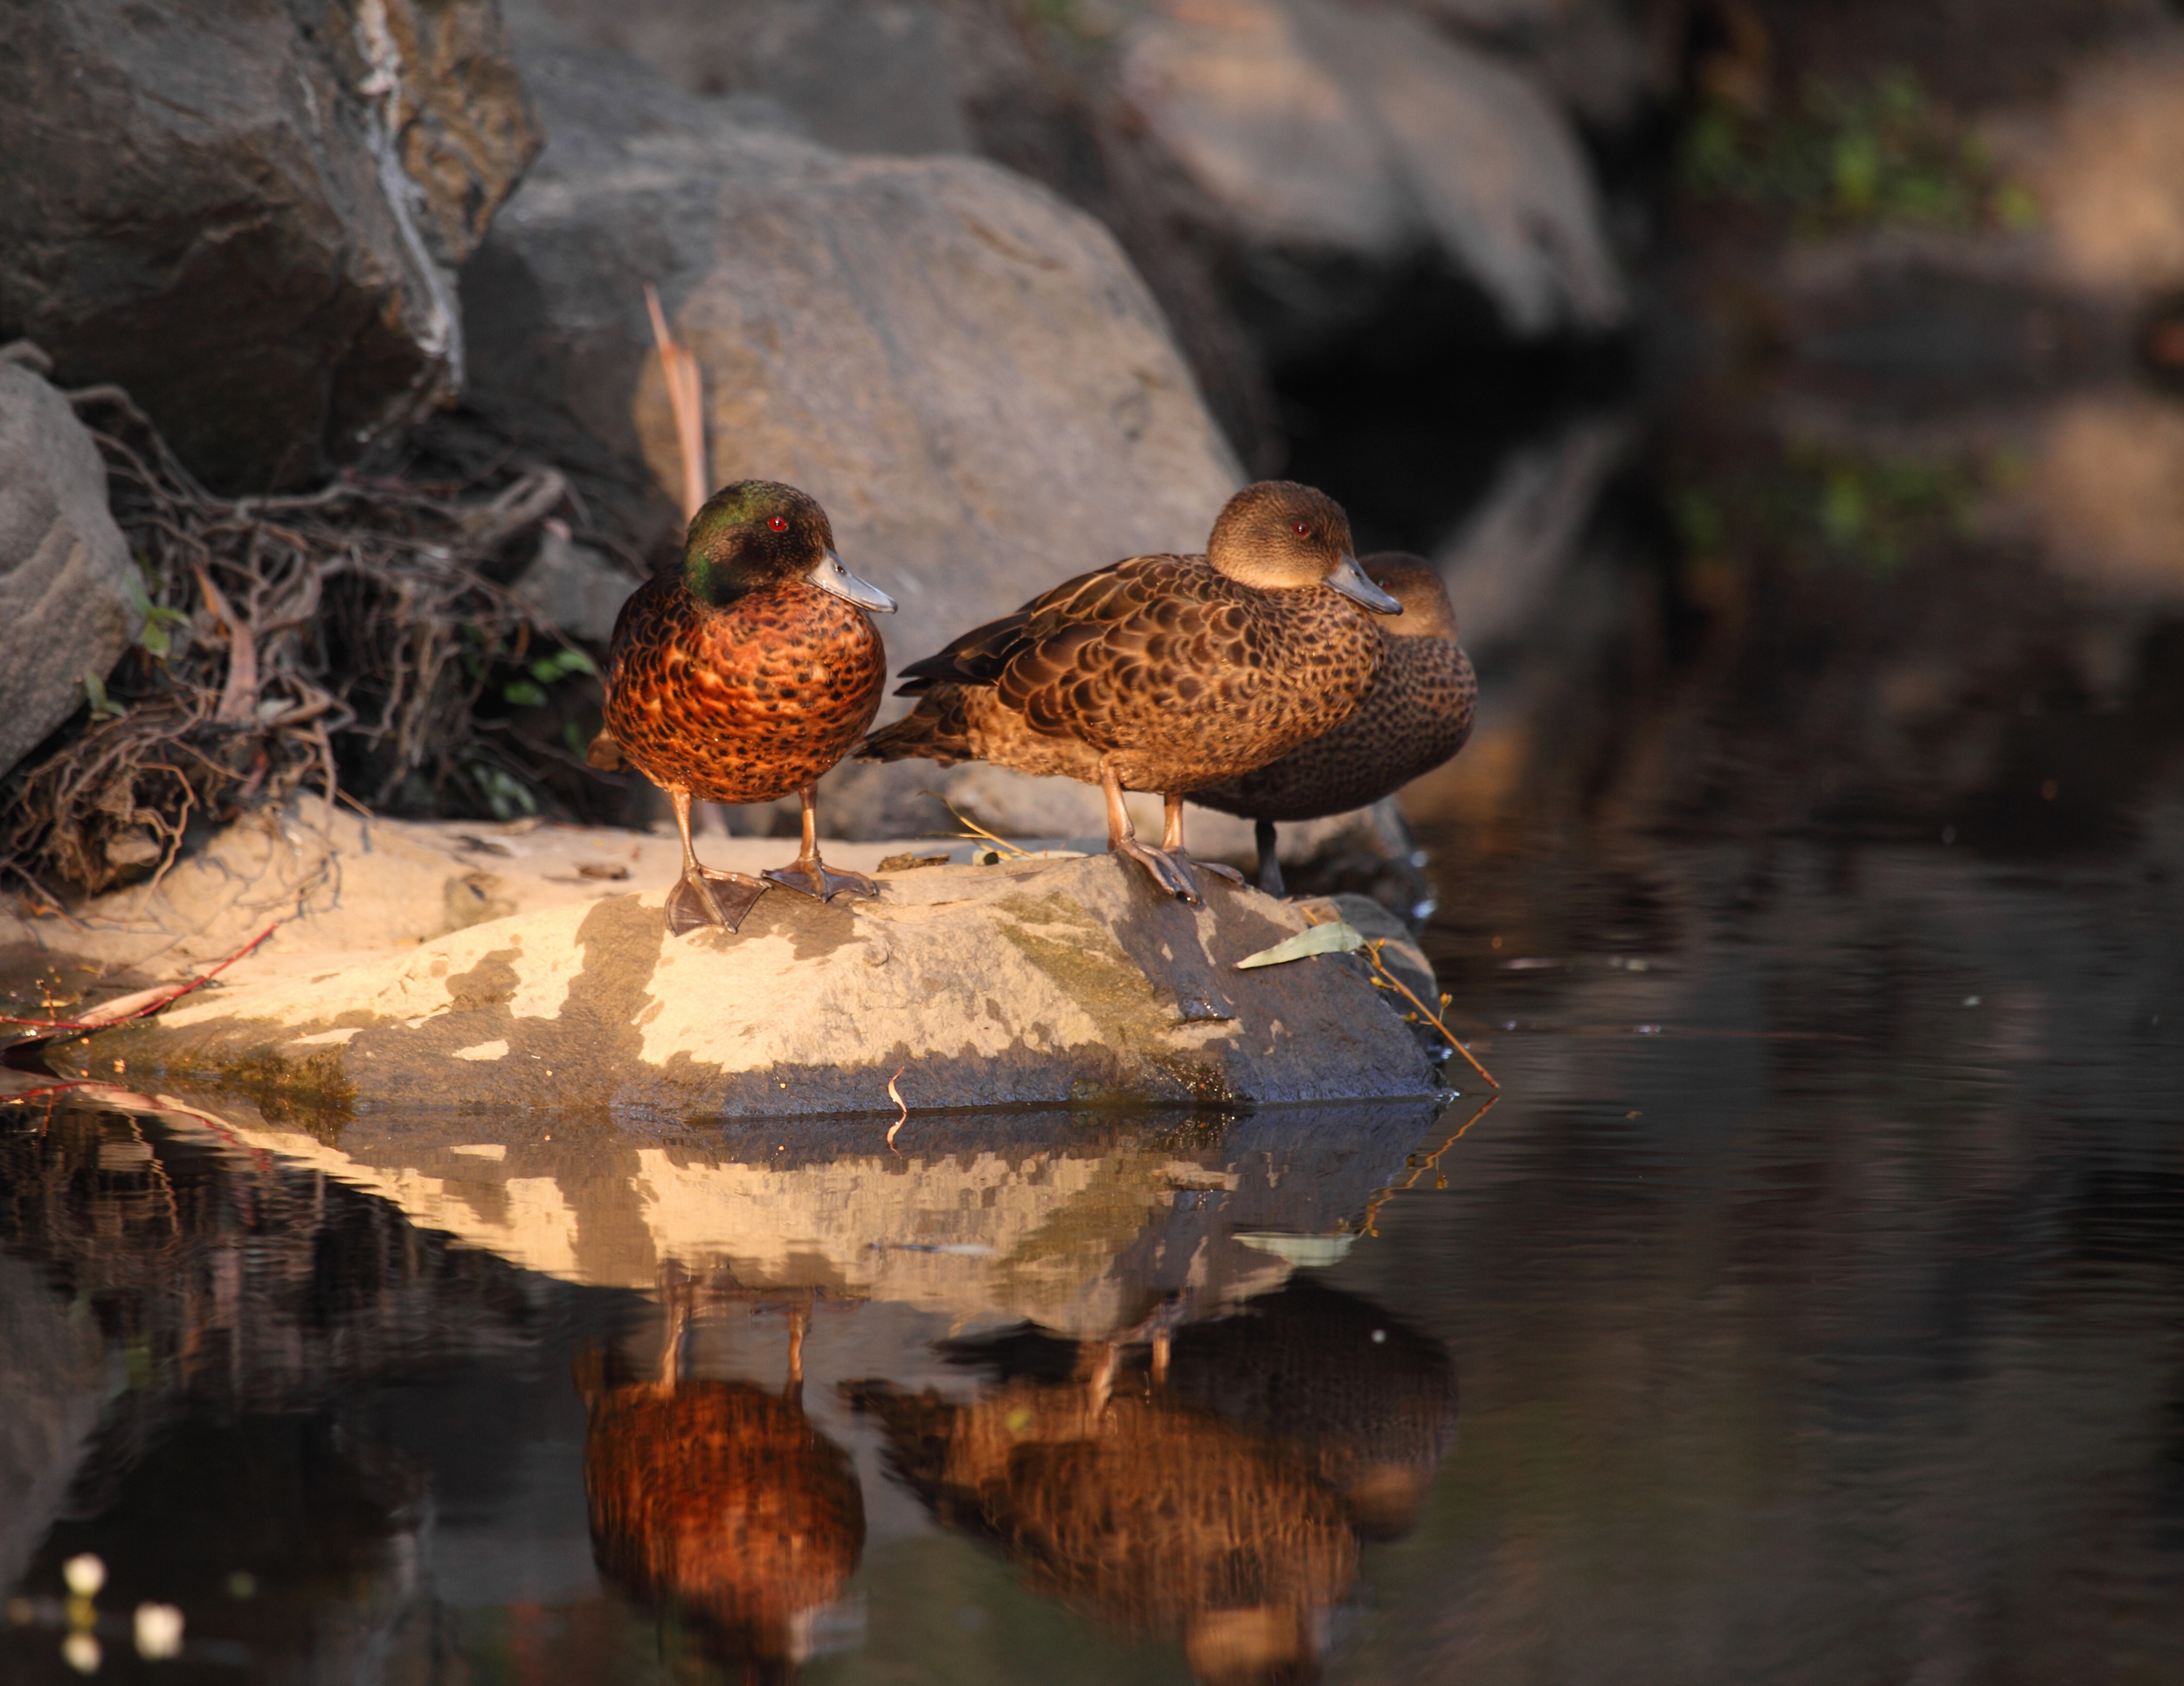 Chestnut Teals on Koonung Creek: the only duckbills I've seen here so far but I'm still looking...